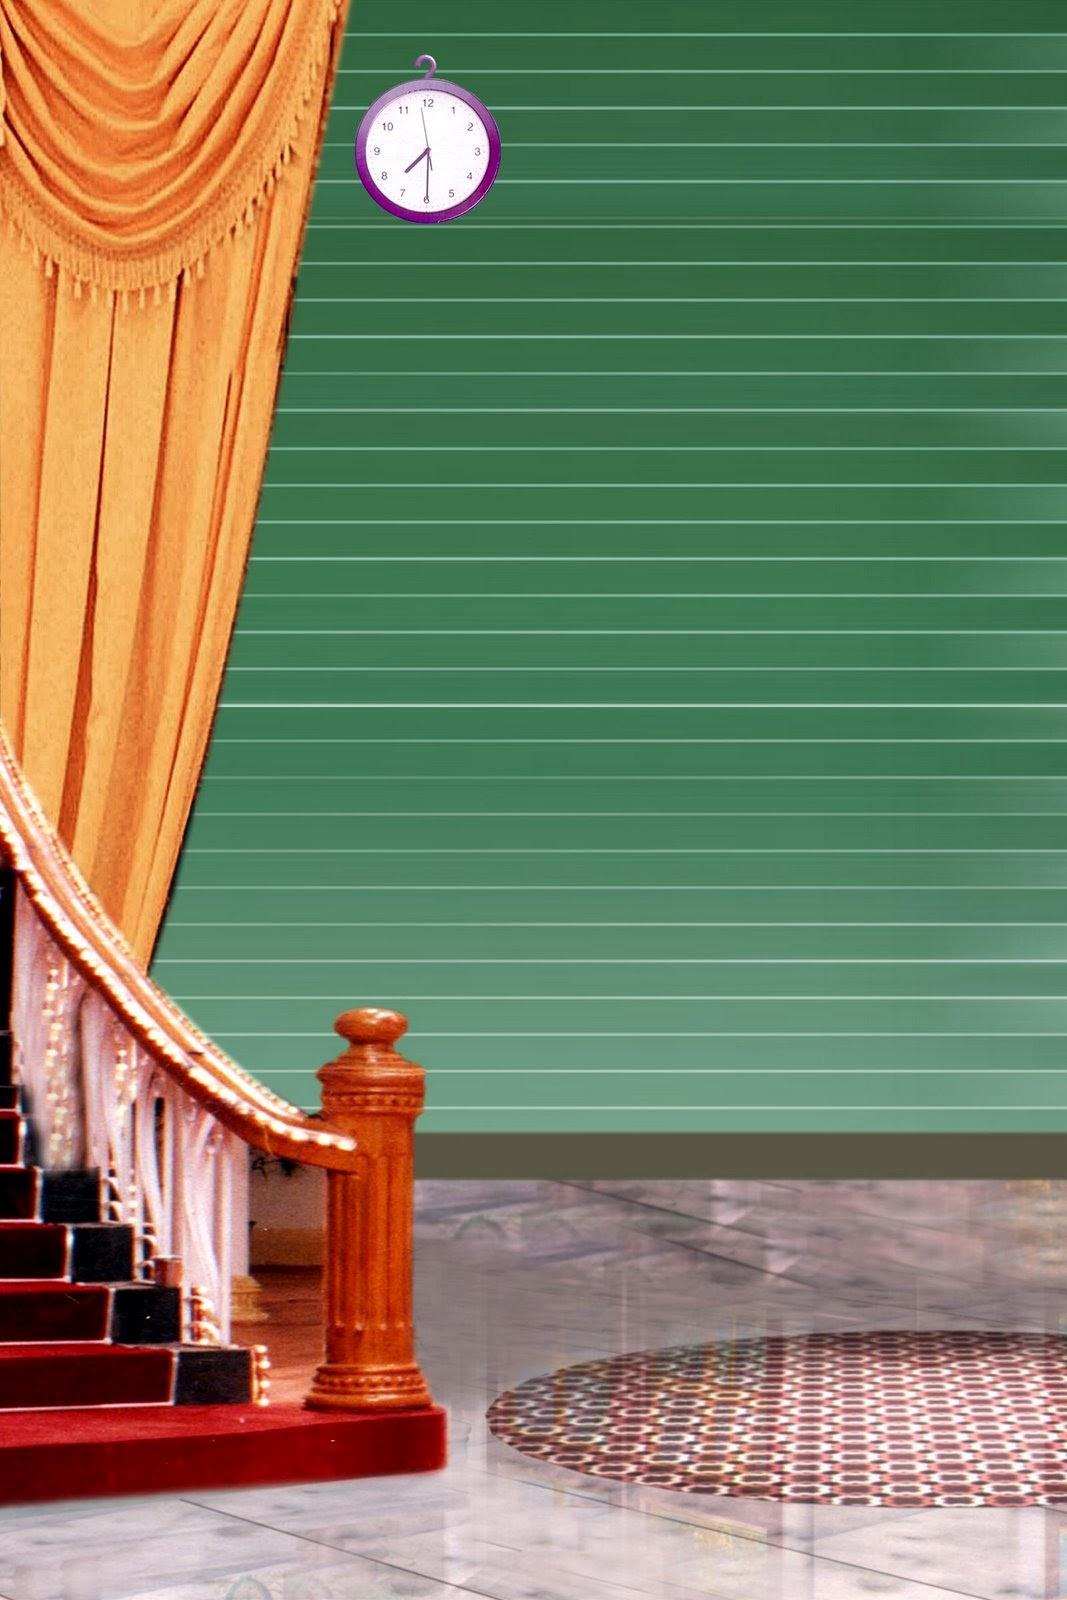 10x36, 12X36, karishma album, karishma album frames, Karizma photo frames, karizma type Background, marriage album frames, photo studio background, photos frames, Photoshop back grounds, studio background